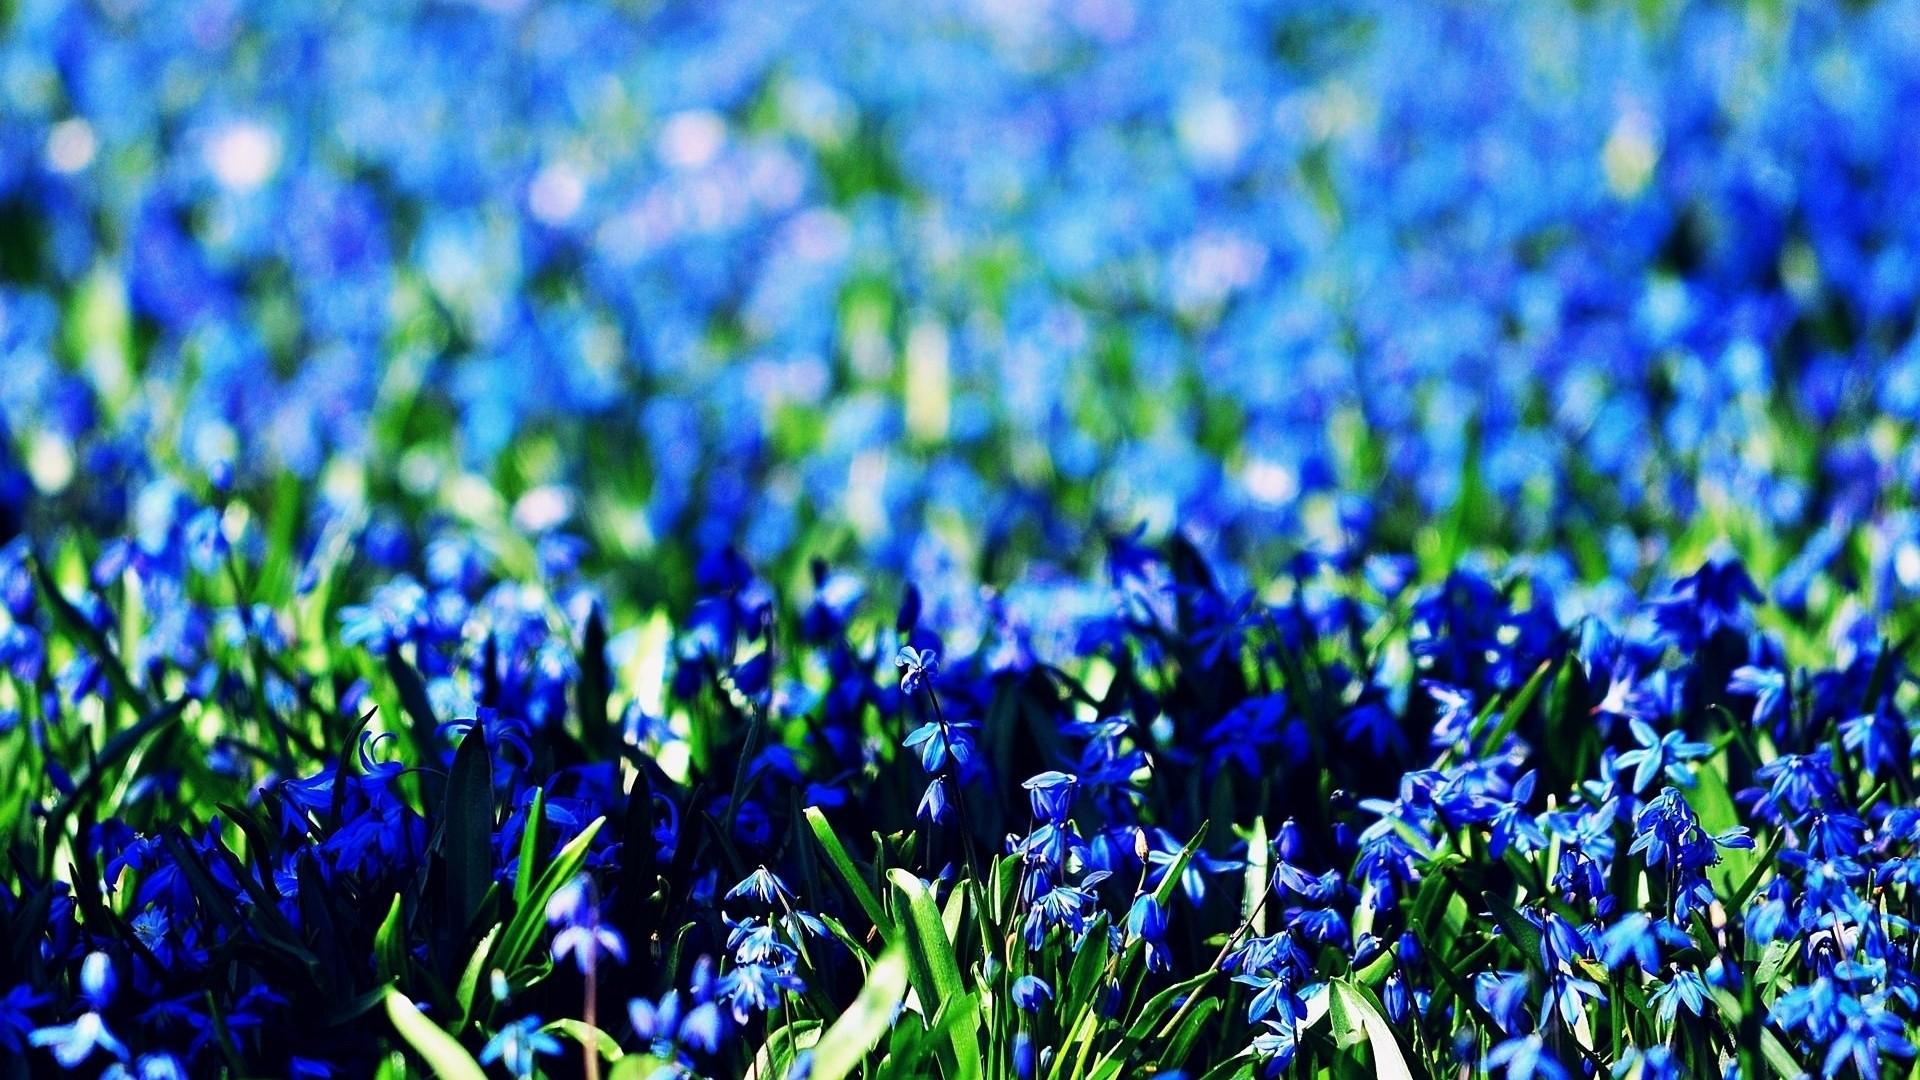 Blue Flower Wallpaper theme